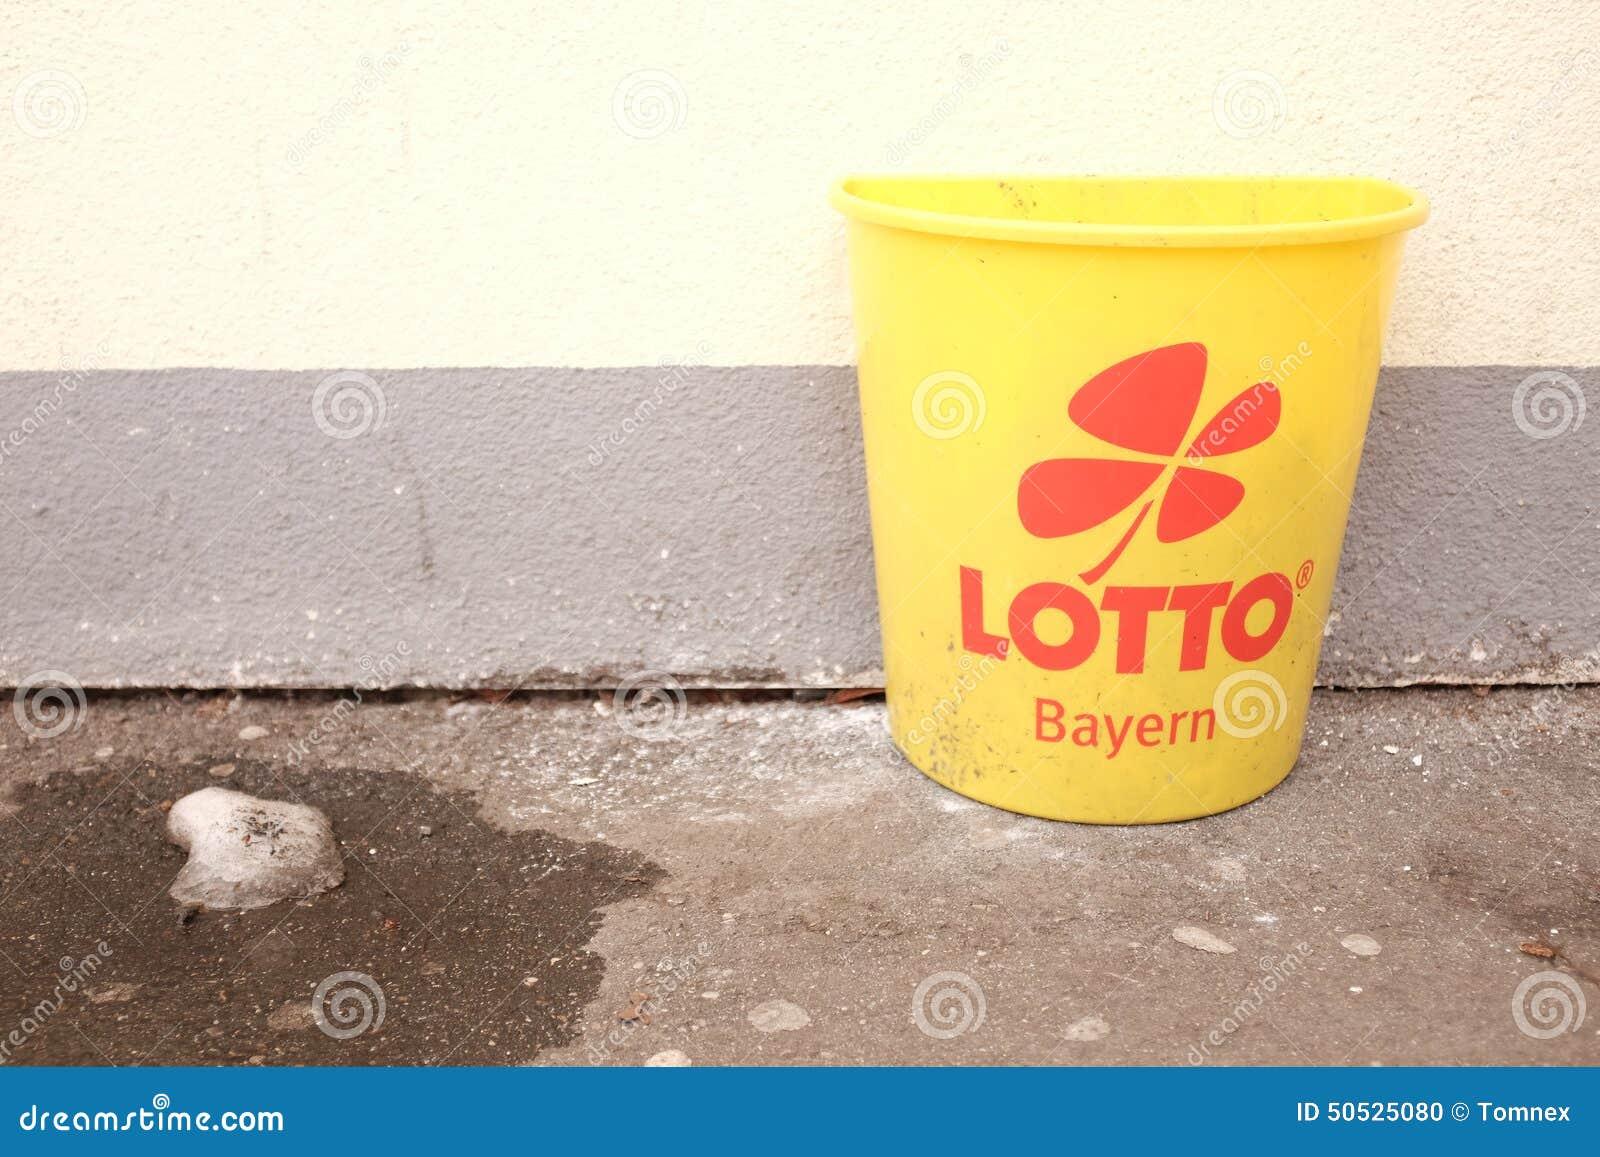 Lotto Bayern Editorial Image Image Of Bavarian Germany 50525080